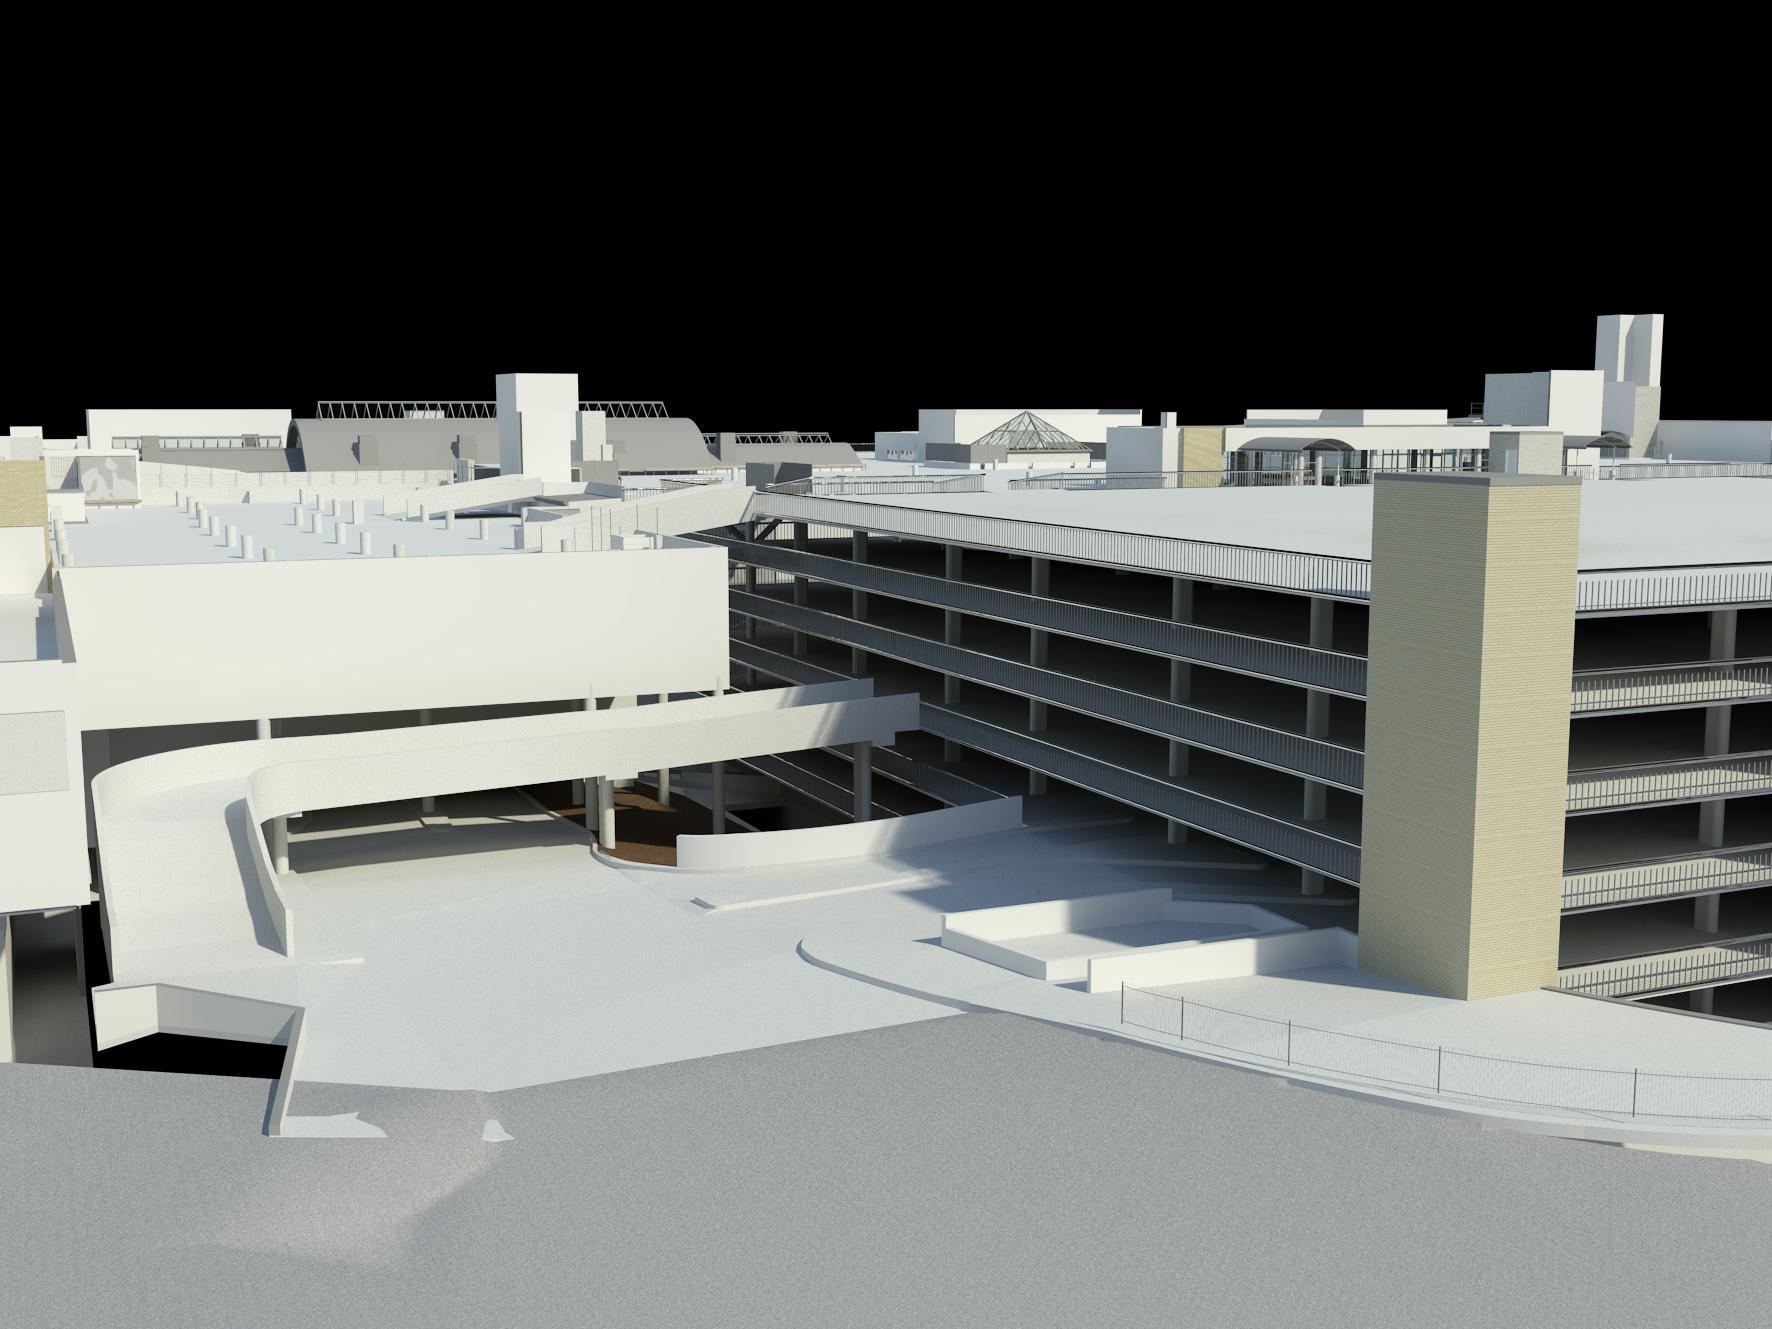 Castle Towers Mall - Revit Model